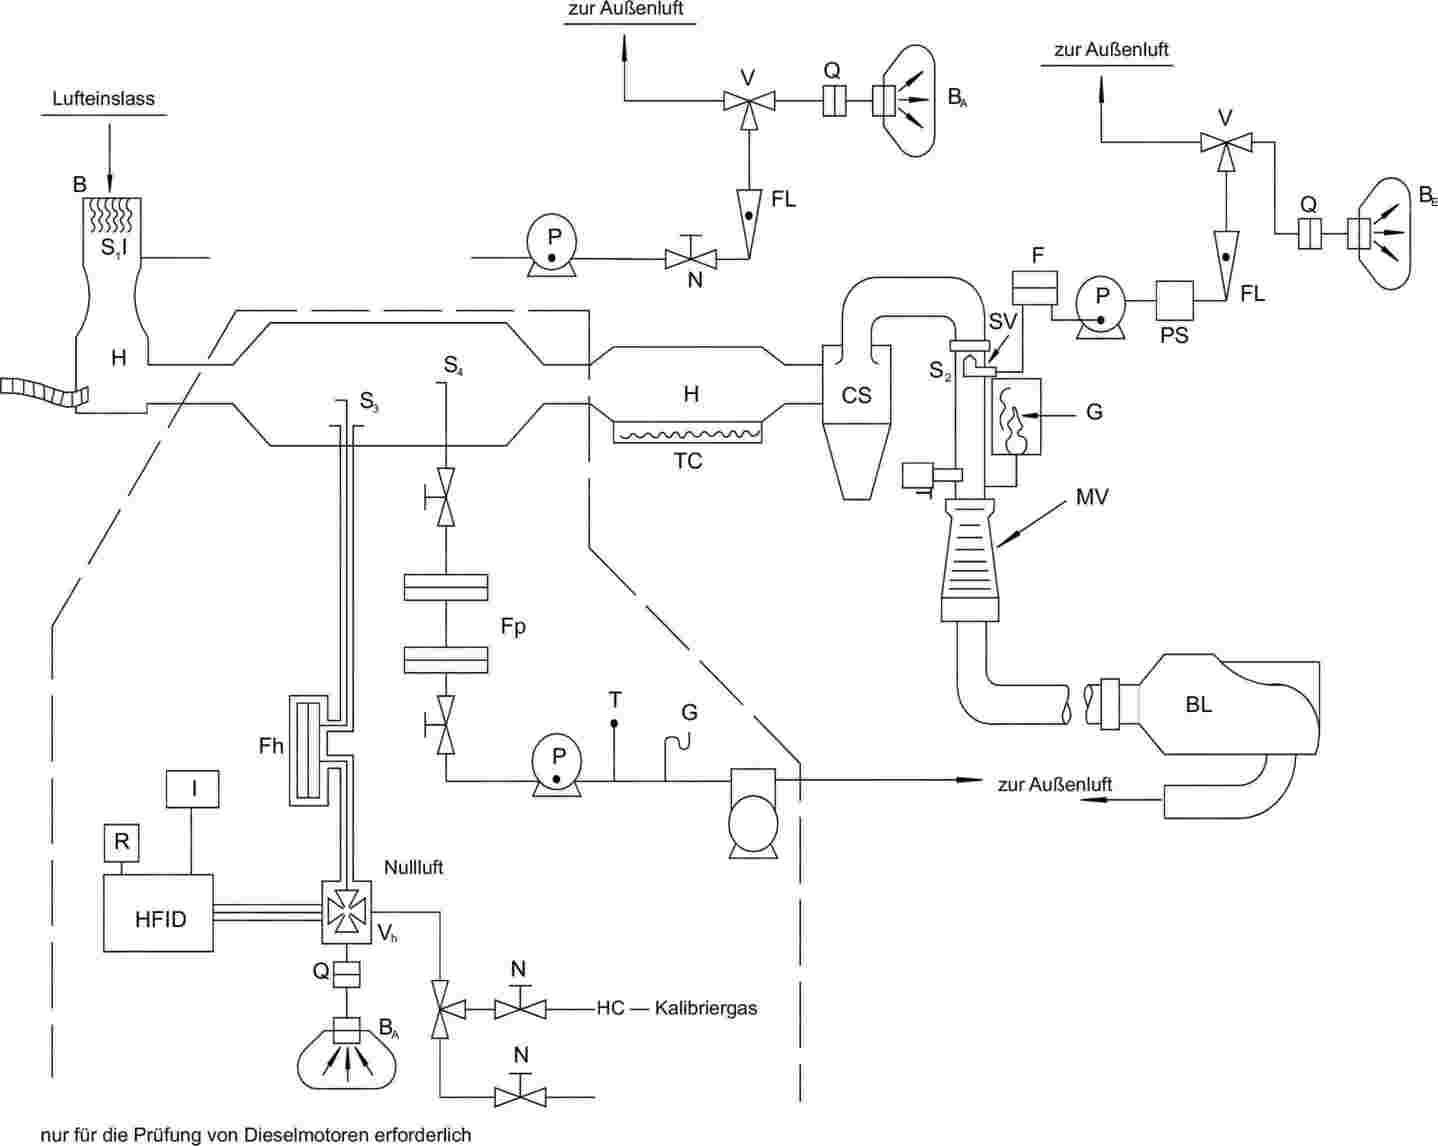 EUR-Lex - 42006X1227(06)R(01) - EN - EUR-Lex